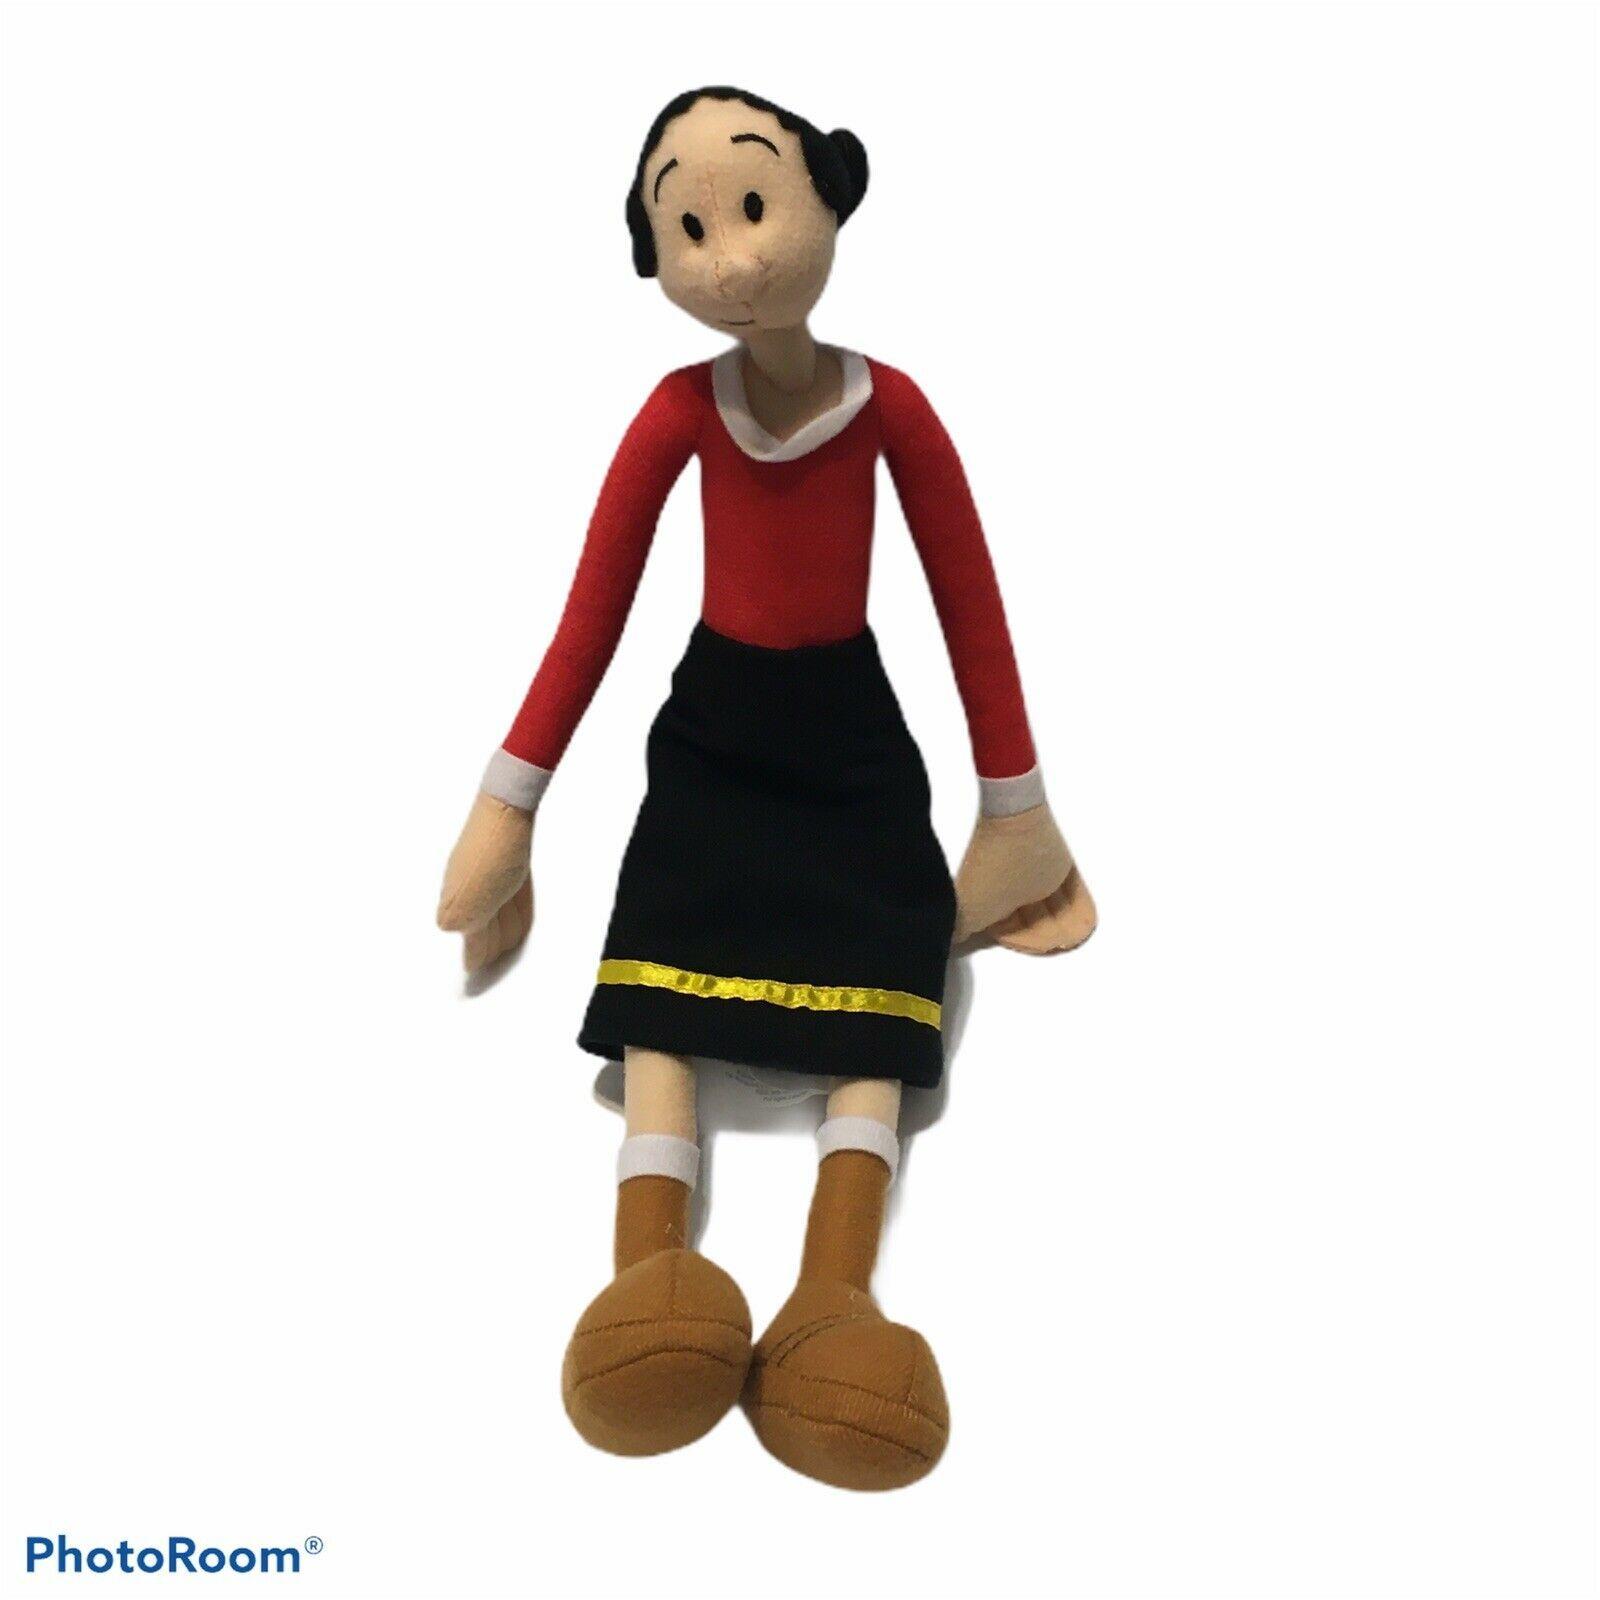 "2011 sugar loaf olive oil plush stuffed doll popeye 15"" sailor P2 - $15.90"